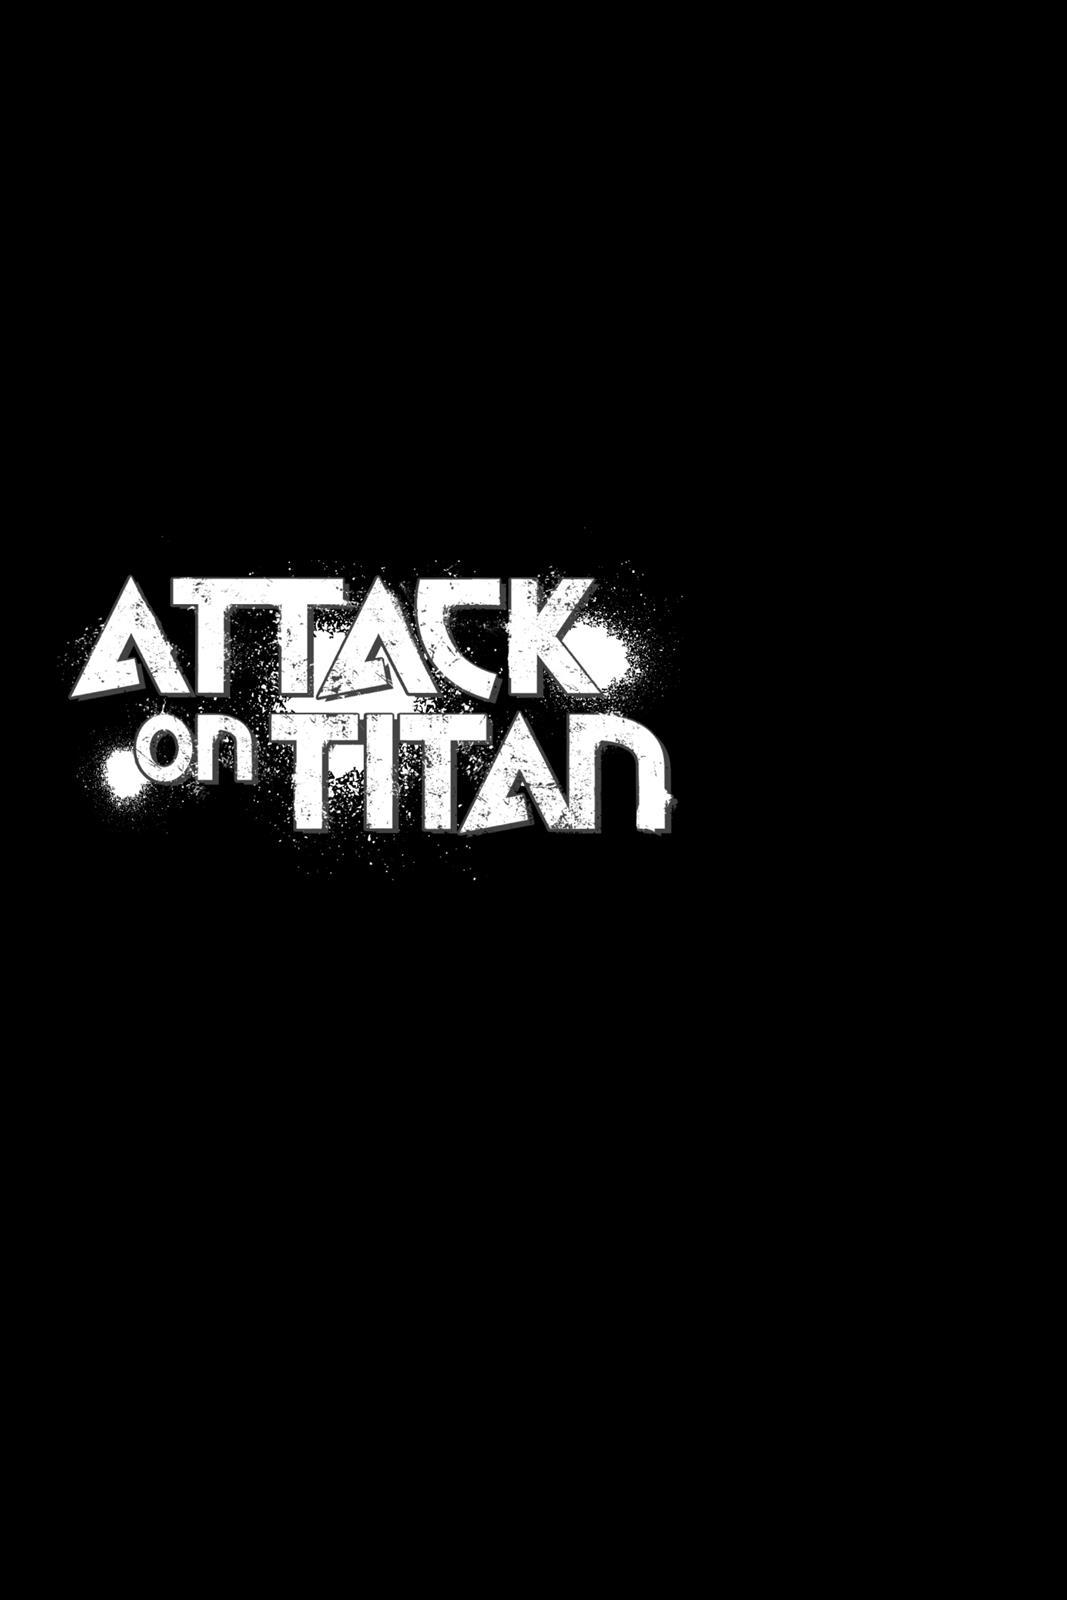 Attack On Titan, Episode 104 image 043